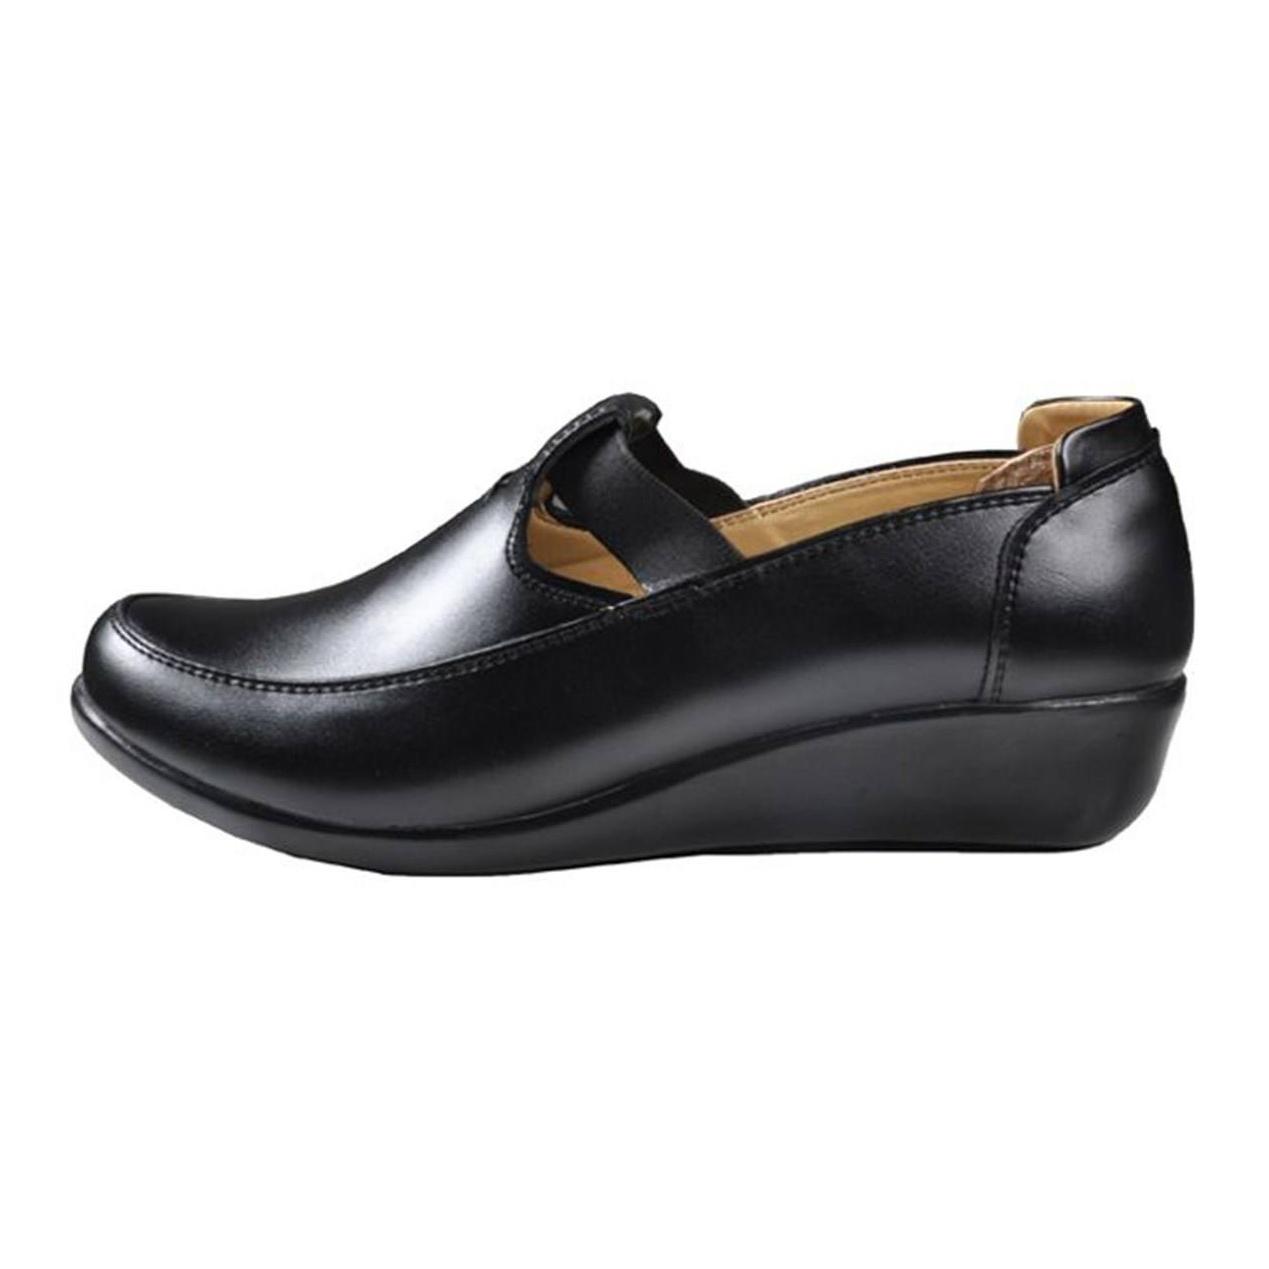 کفش روزمره زنانه مدل NG Z 2078 M